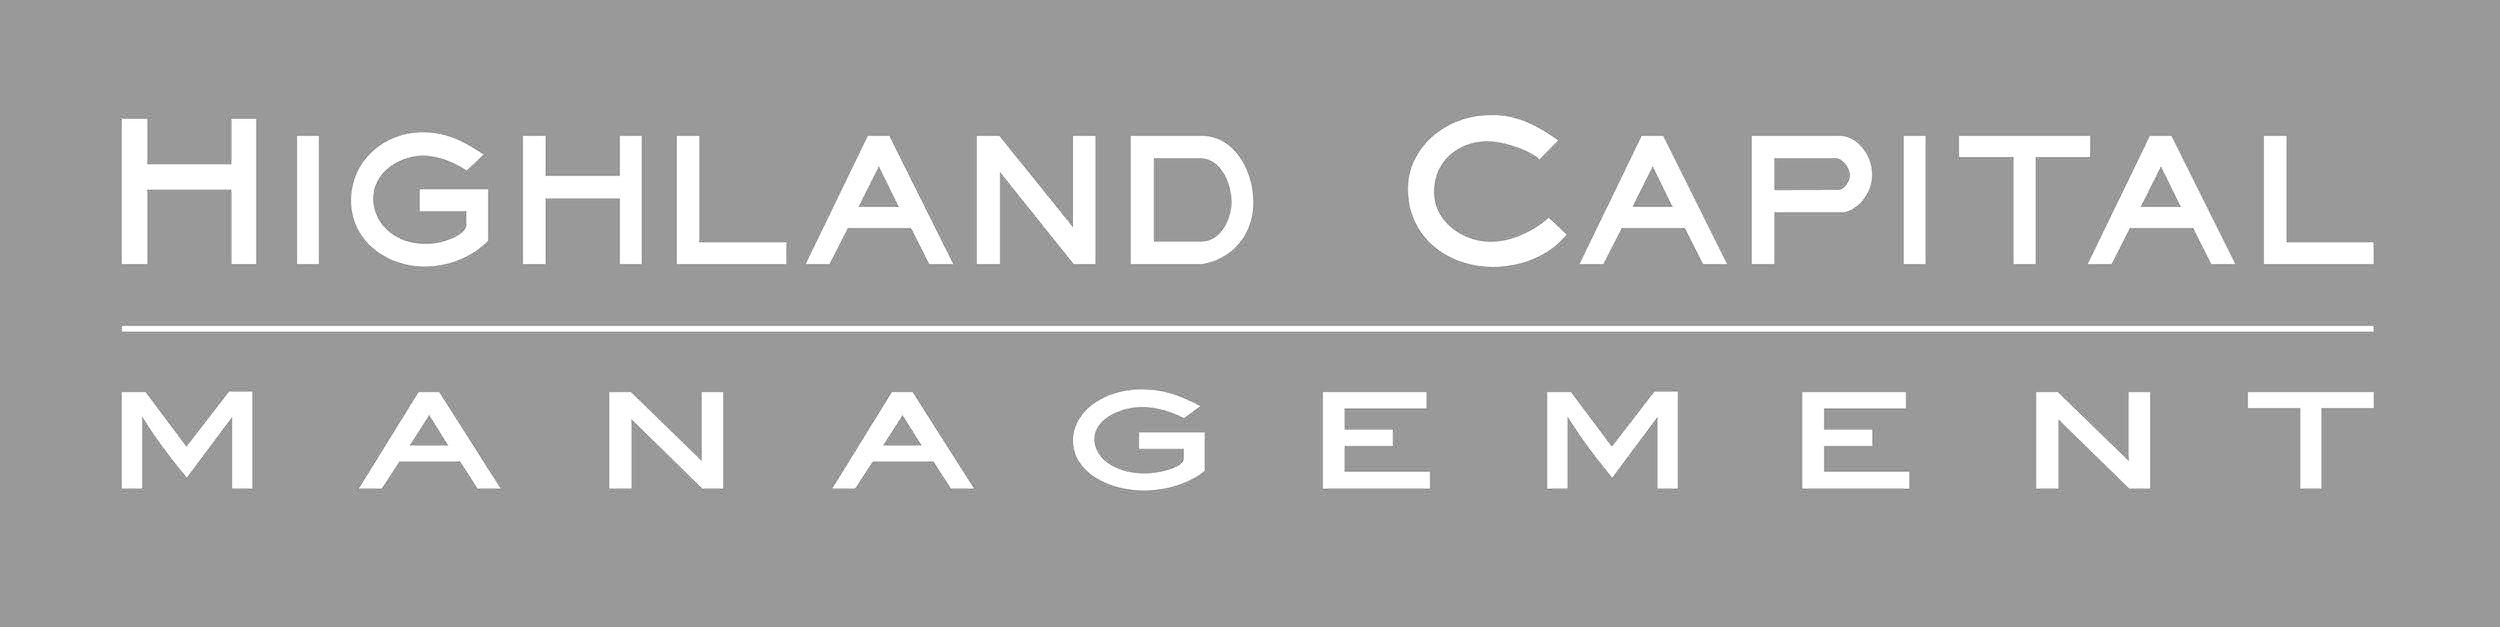 Copy of Highland Capital Management Logo 1200.jpg